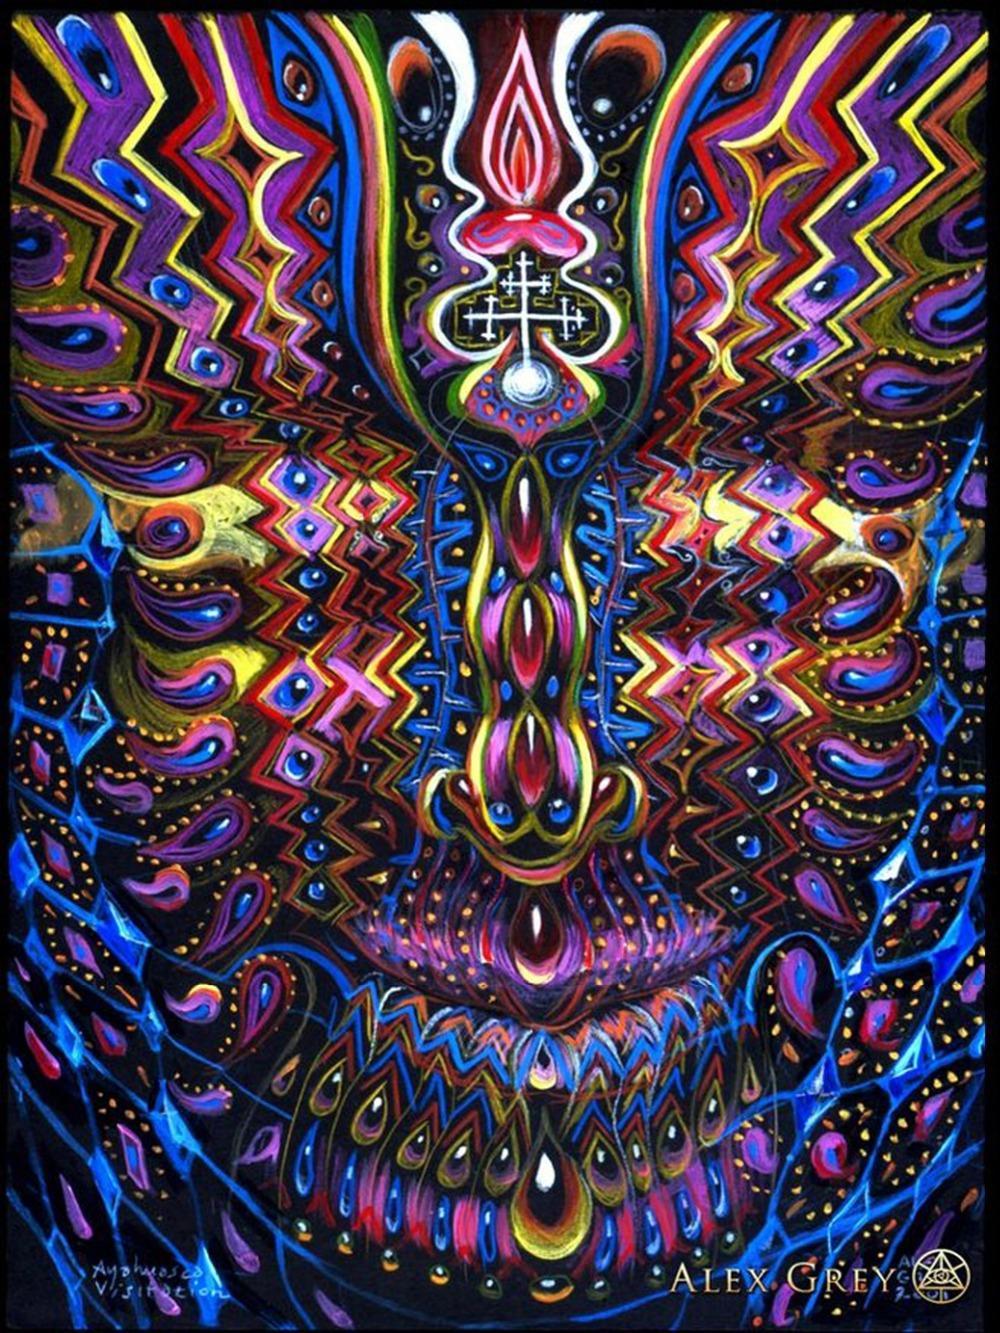 Trippy Alex Grey Abstract Art Print Poster 17''x13'' inch 023